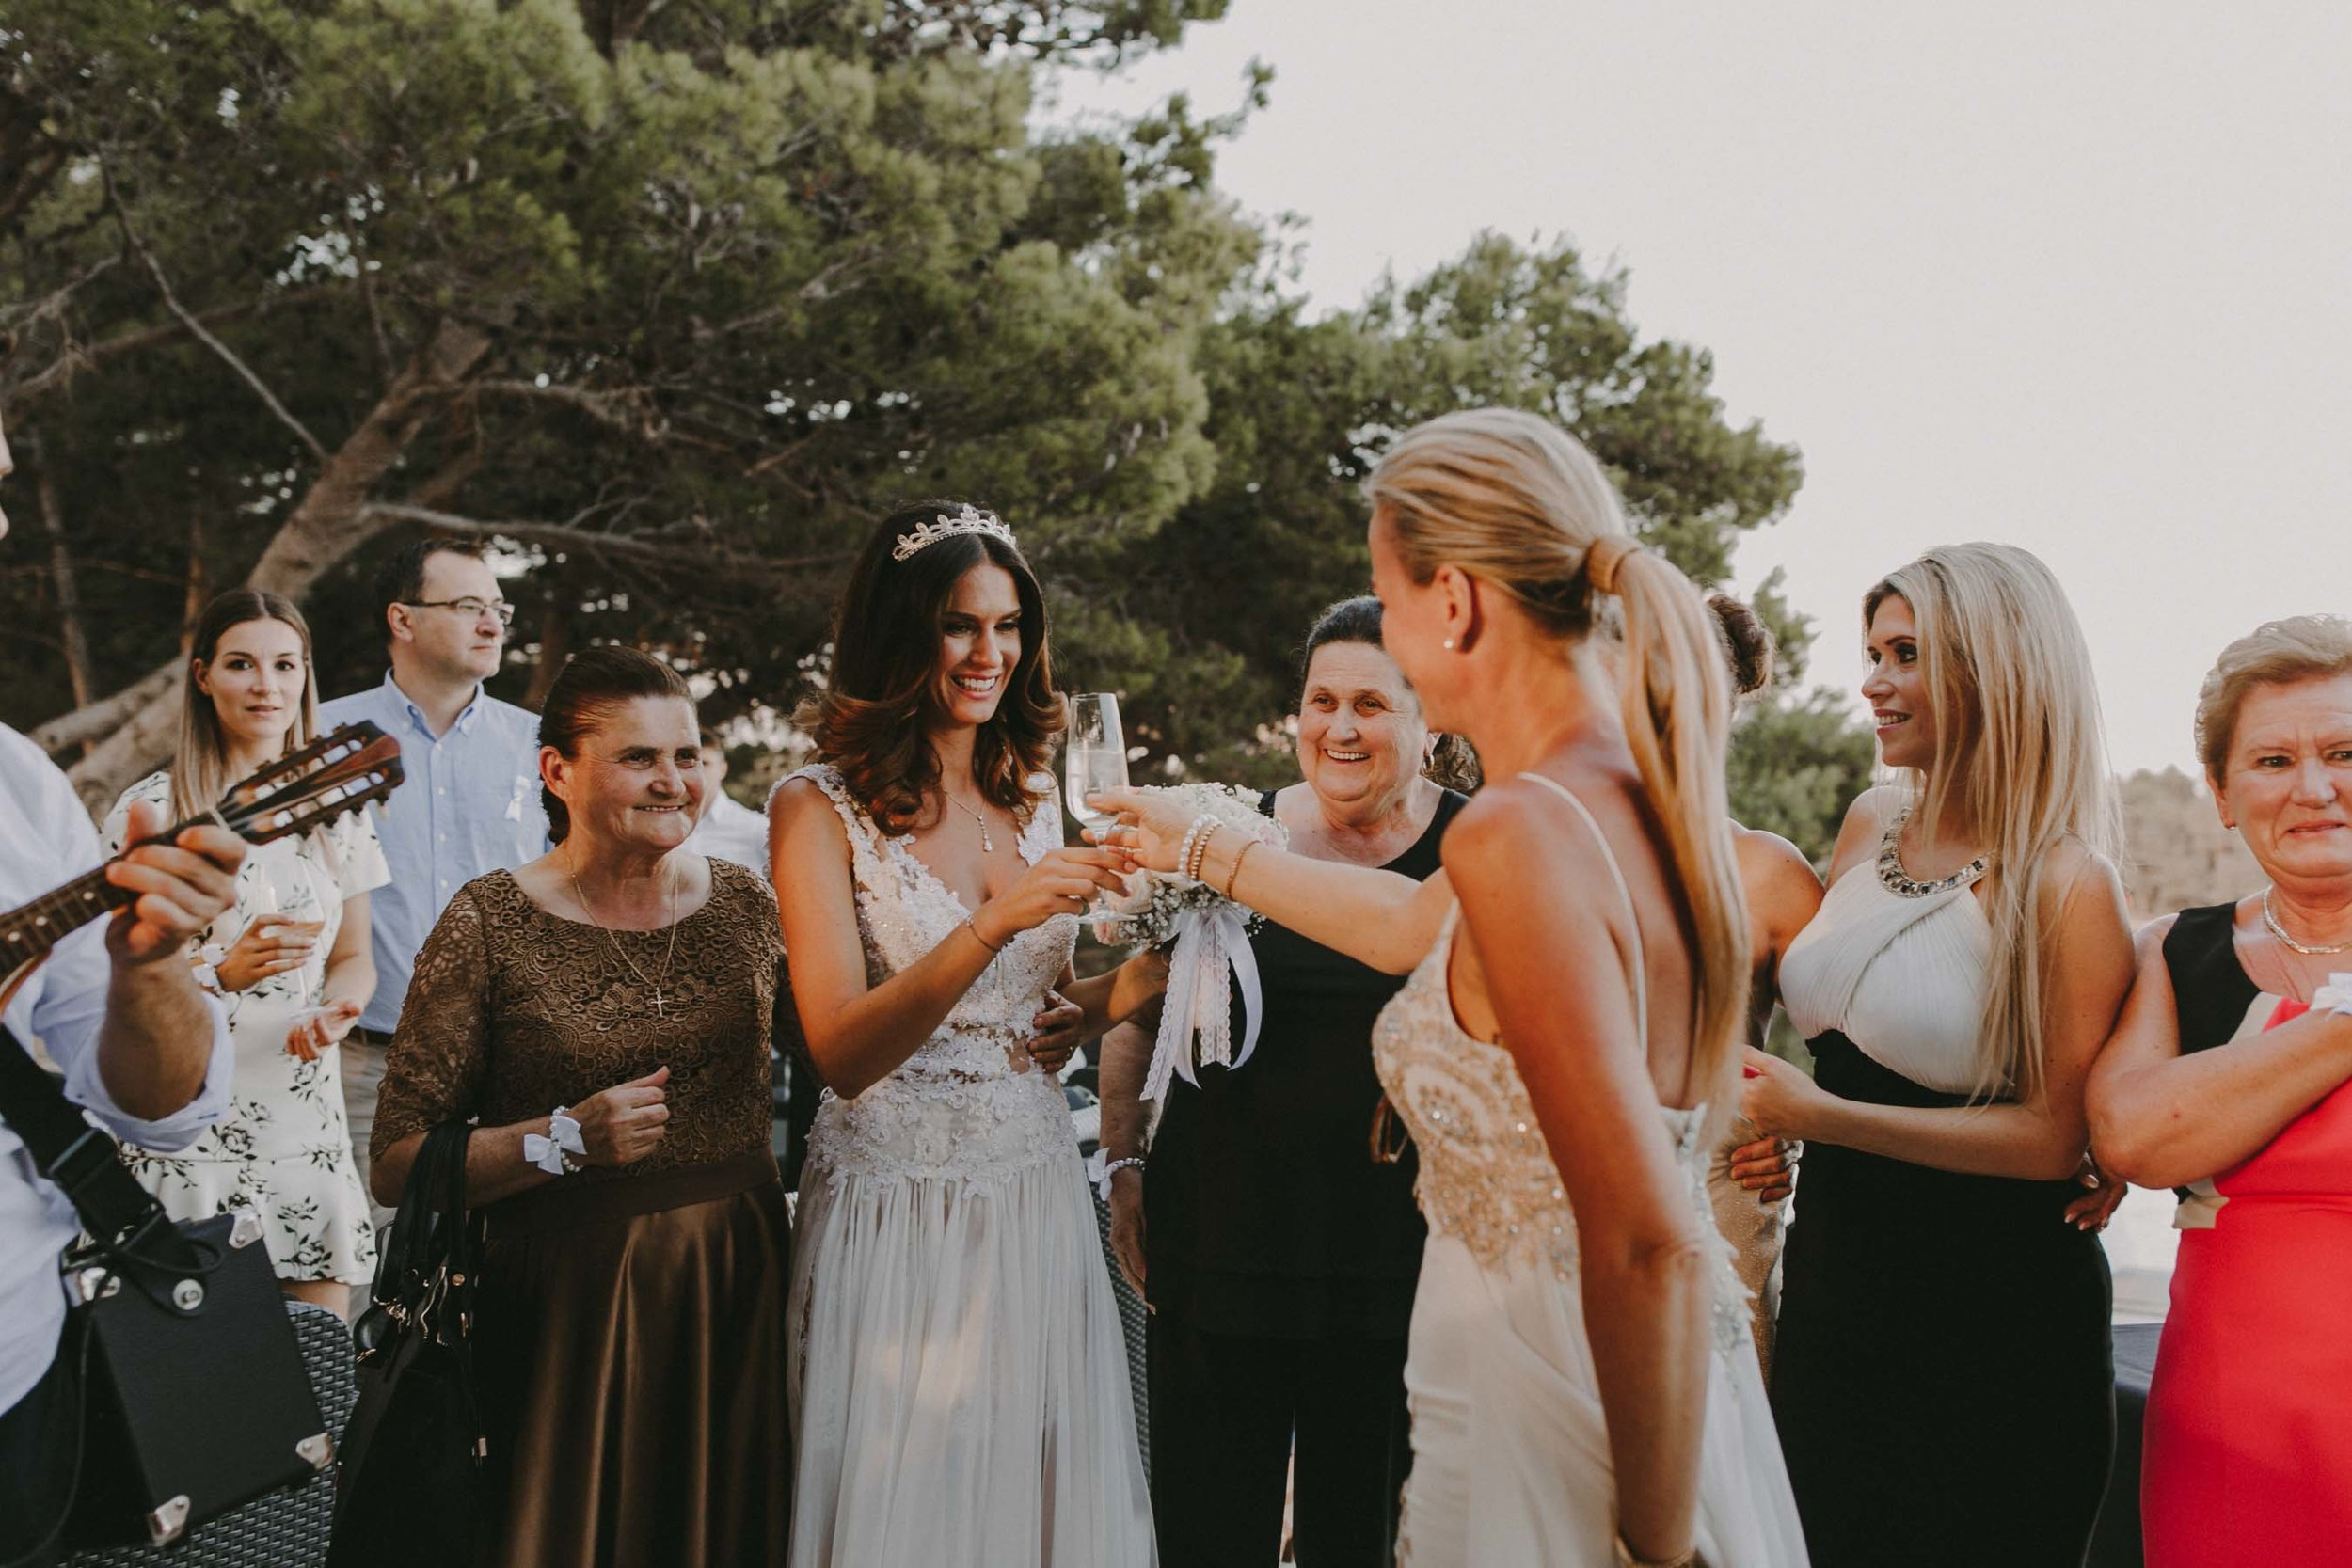 sylvia&dimitri-Wedding-Crvena_Luka-Croatia-51(7855).jpg